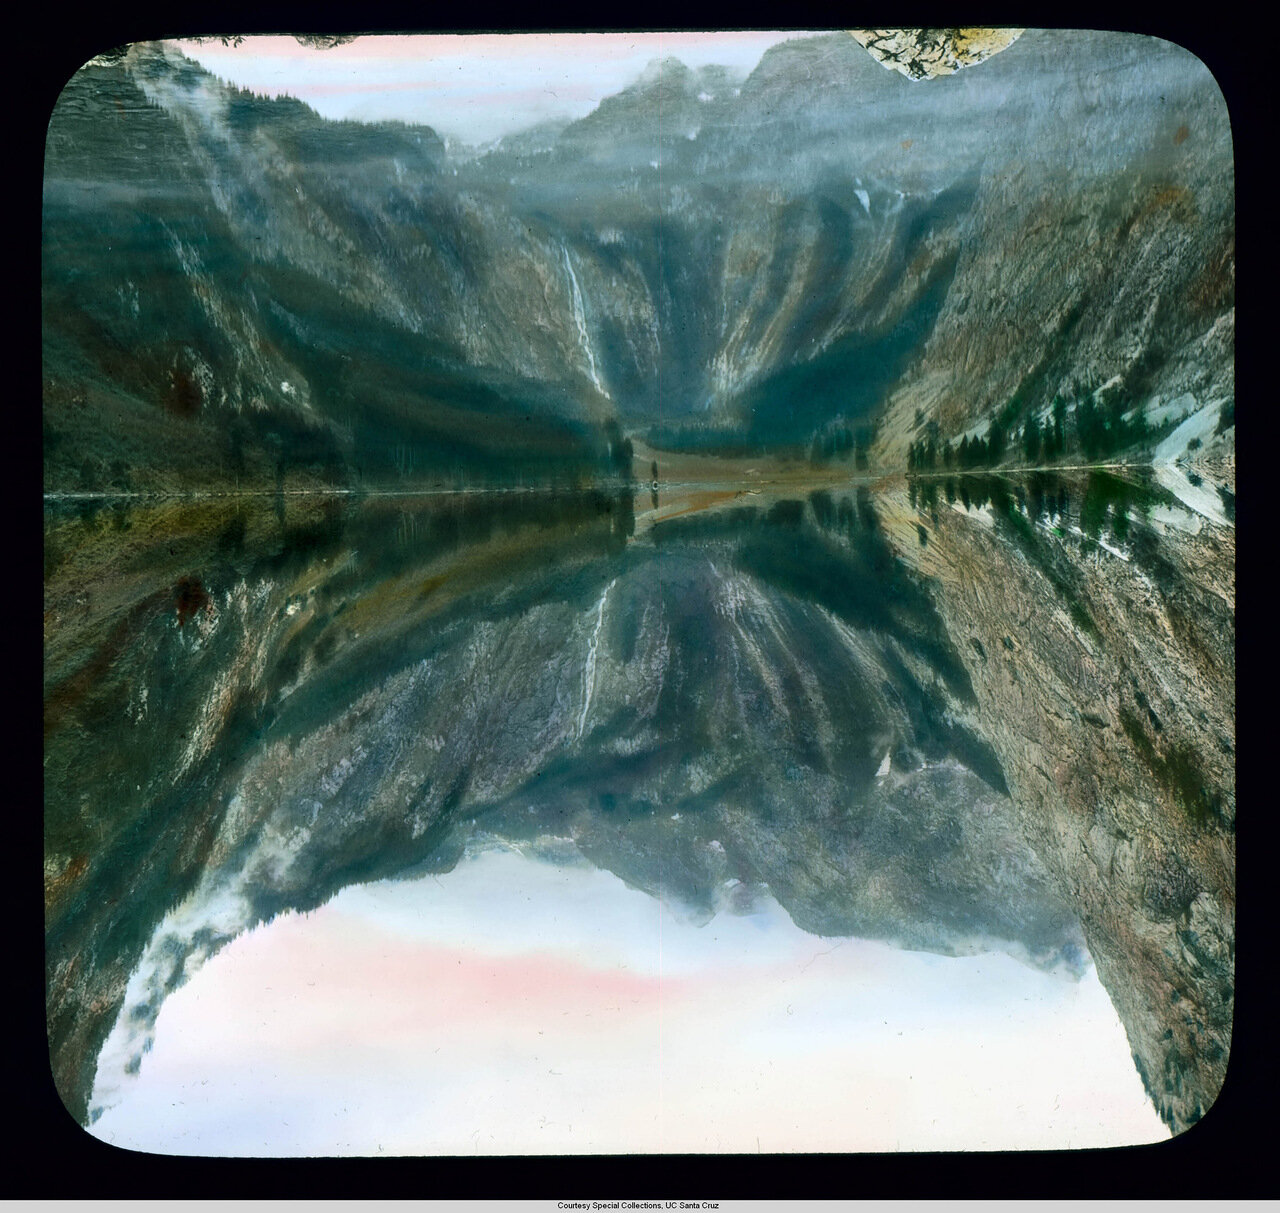 Бавария. Озеро Оберси с водопадом Ротбах